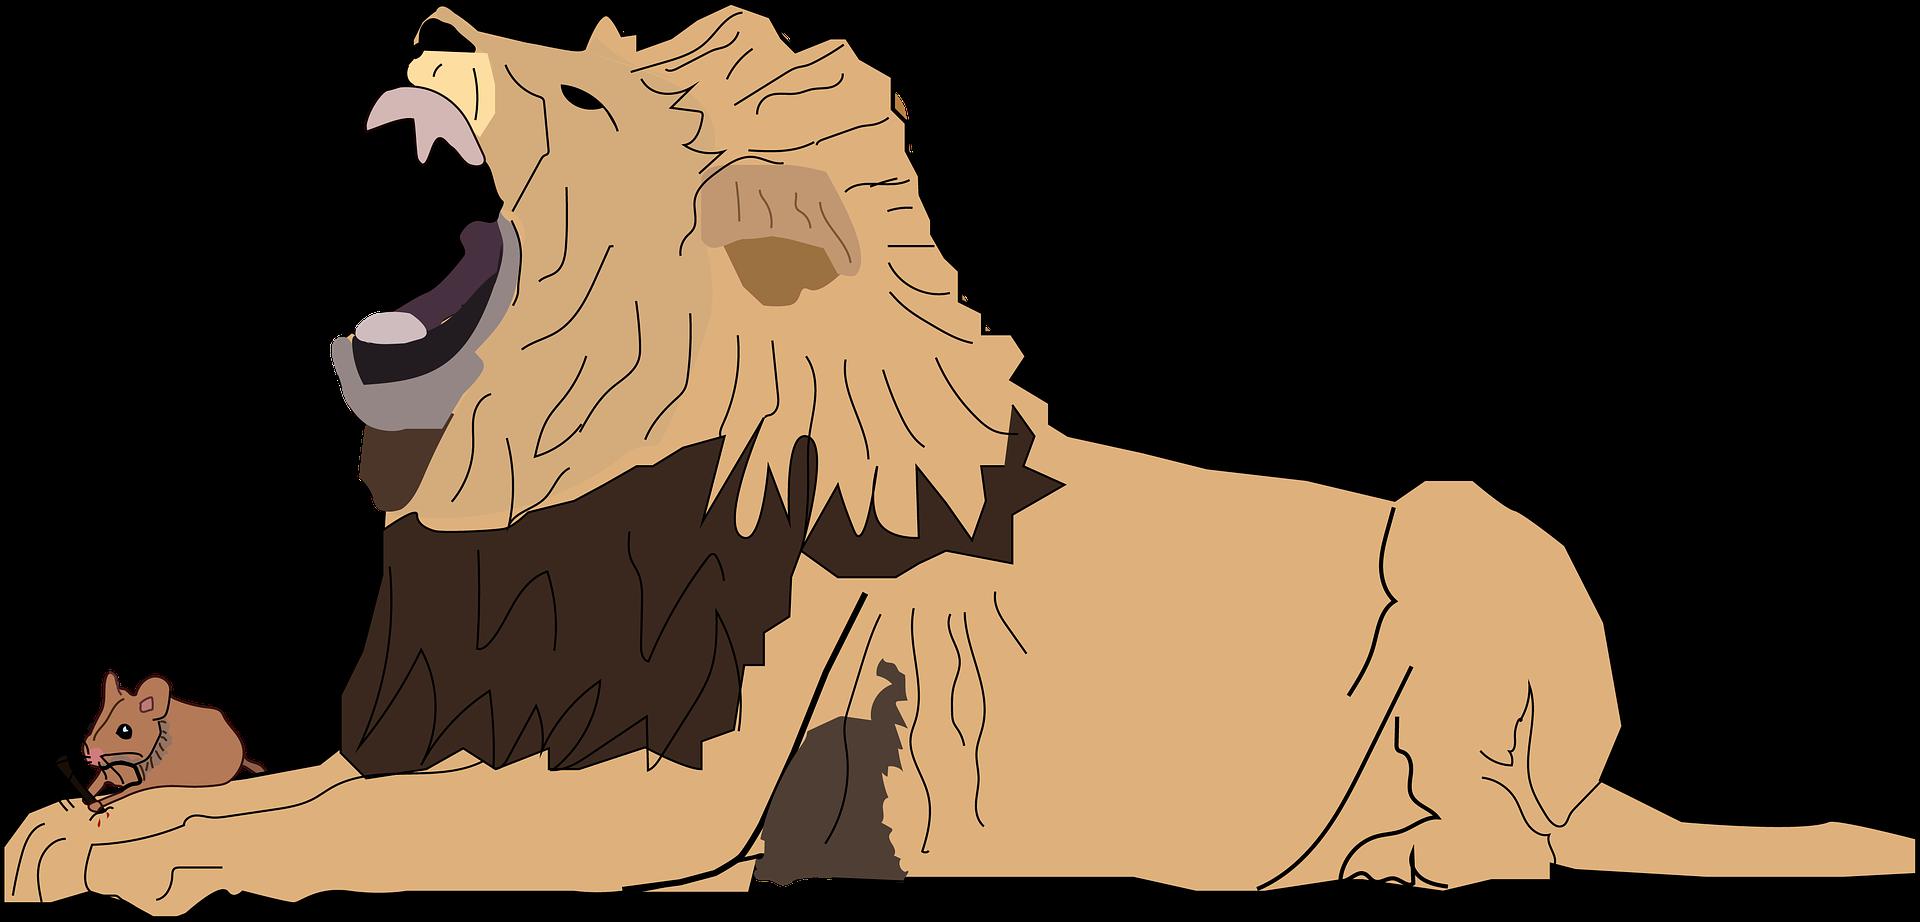 lion-3347435_1920.png